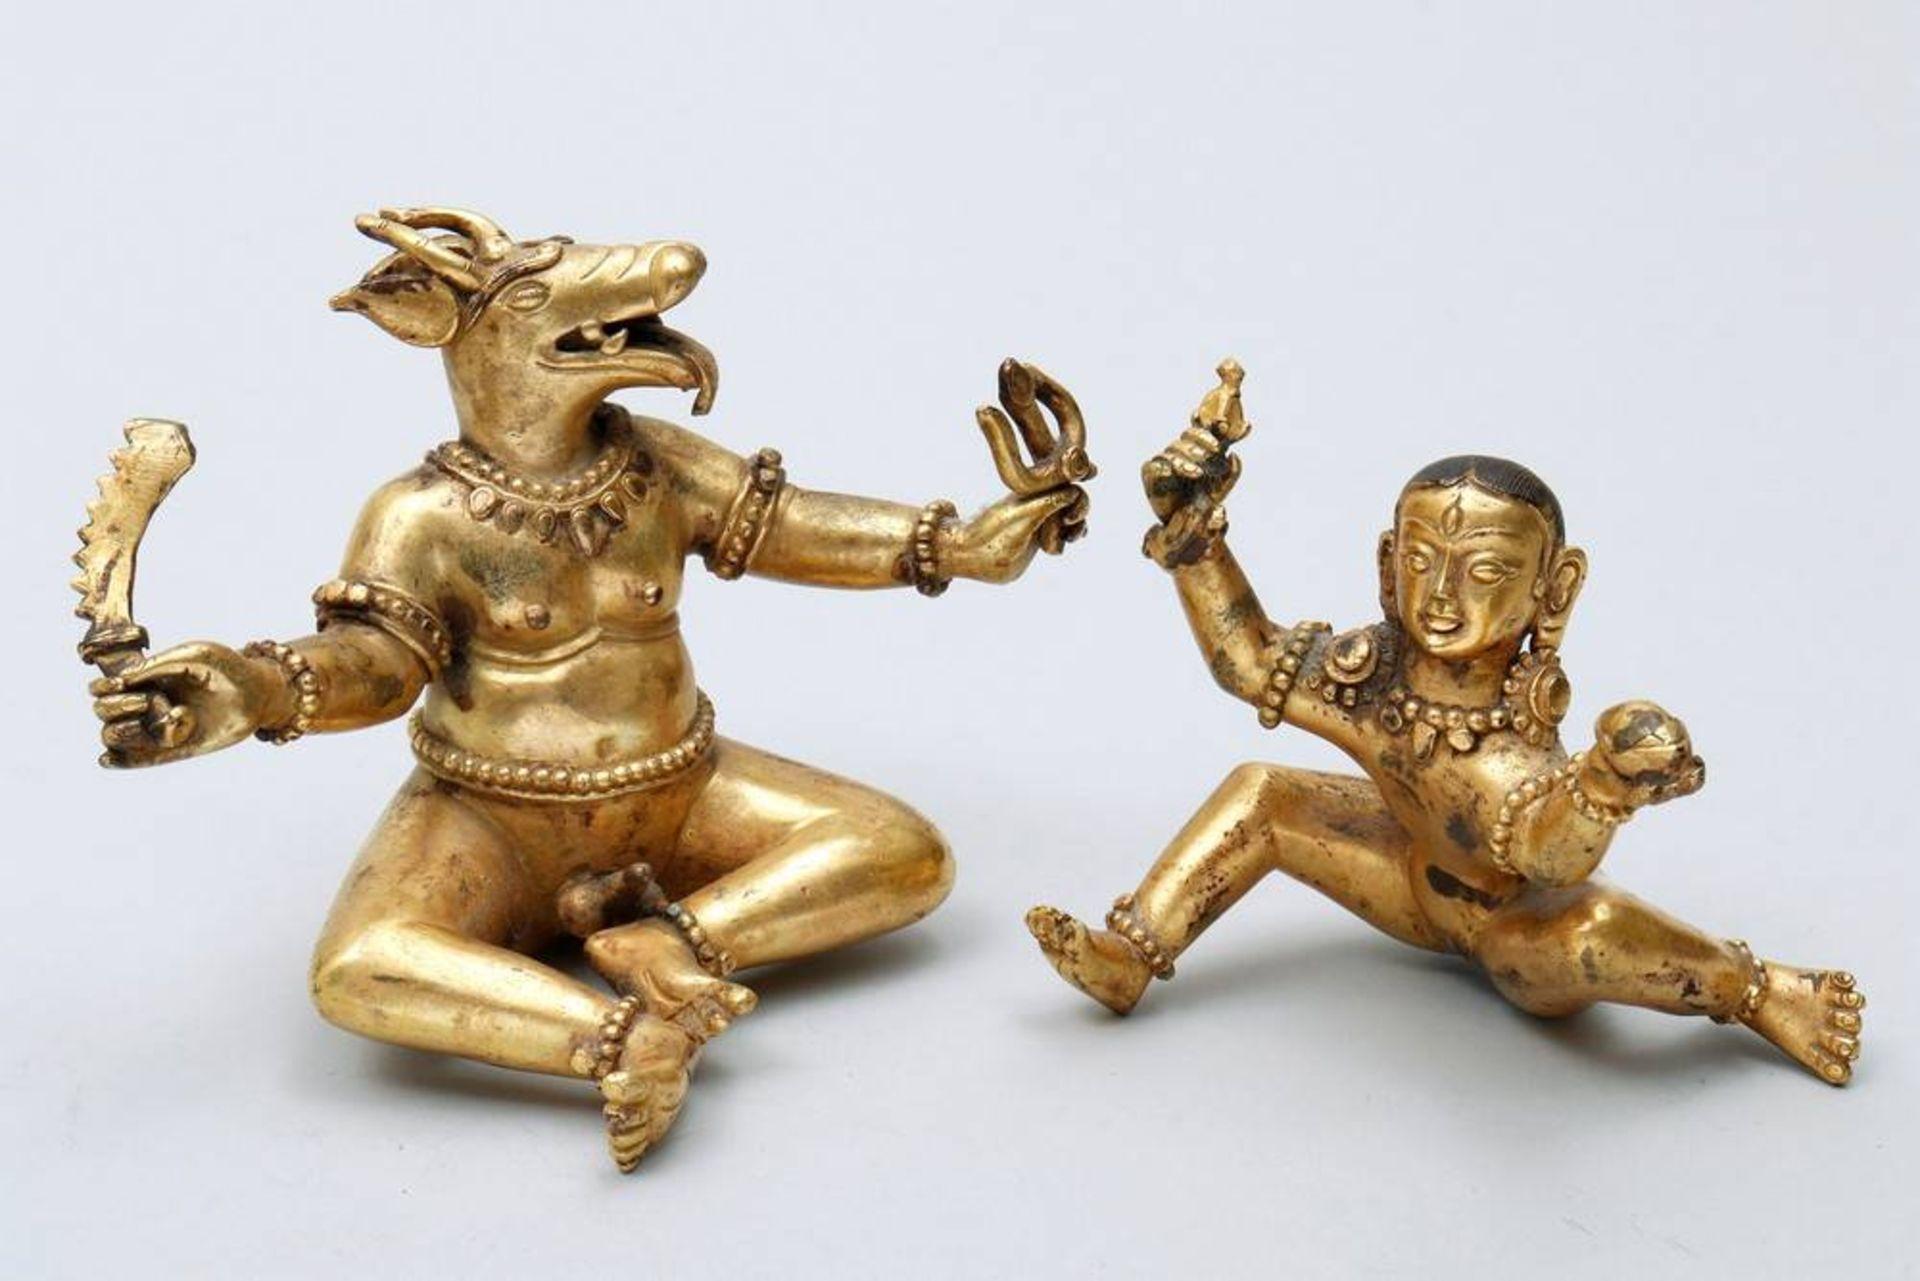 Buddhistische Gottheit Nepal/Tibet, 18./19.Jh., wohl Yama Dharmaraja mit Chamundi, in sitzender